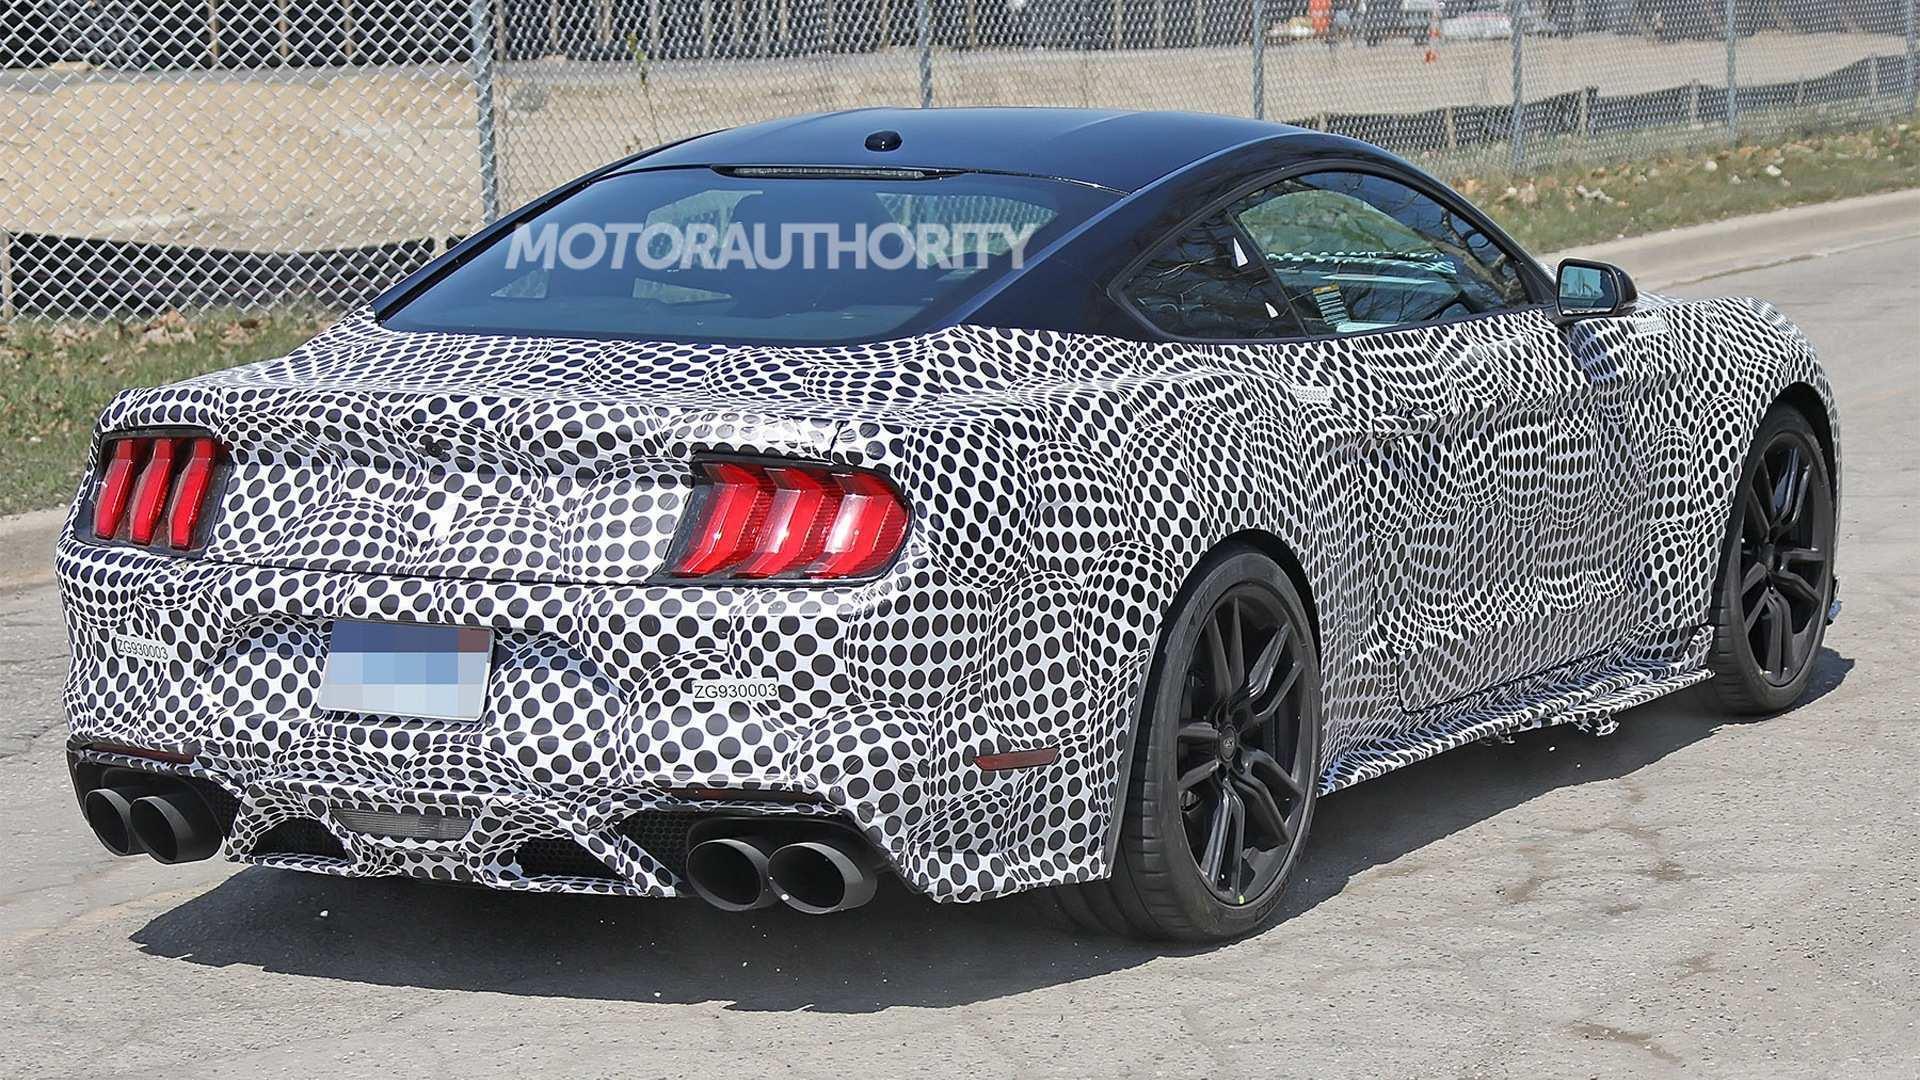 77 Great Spy Shots 2020 Ford Mustang Svt Gt 500 Interior with Spy Shots 2020 Ford Mustang Svt Gt 500